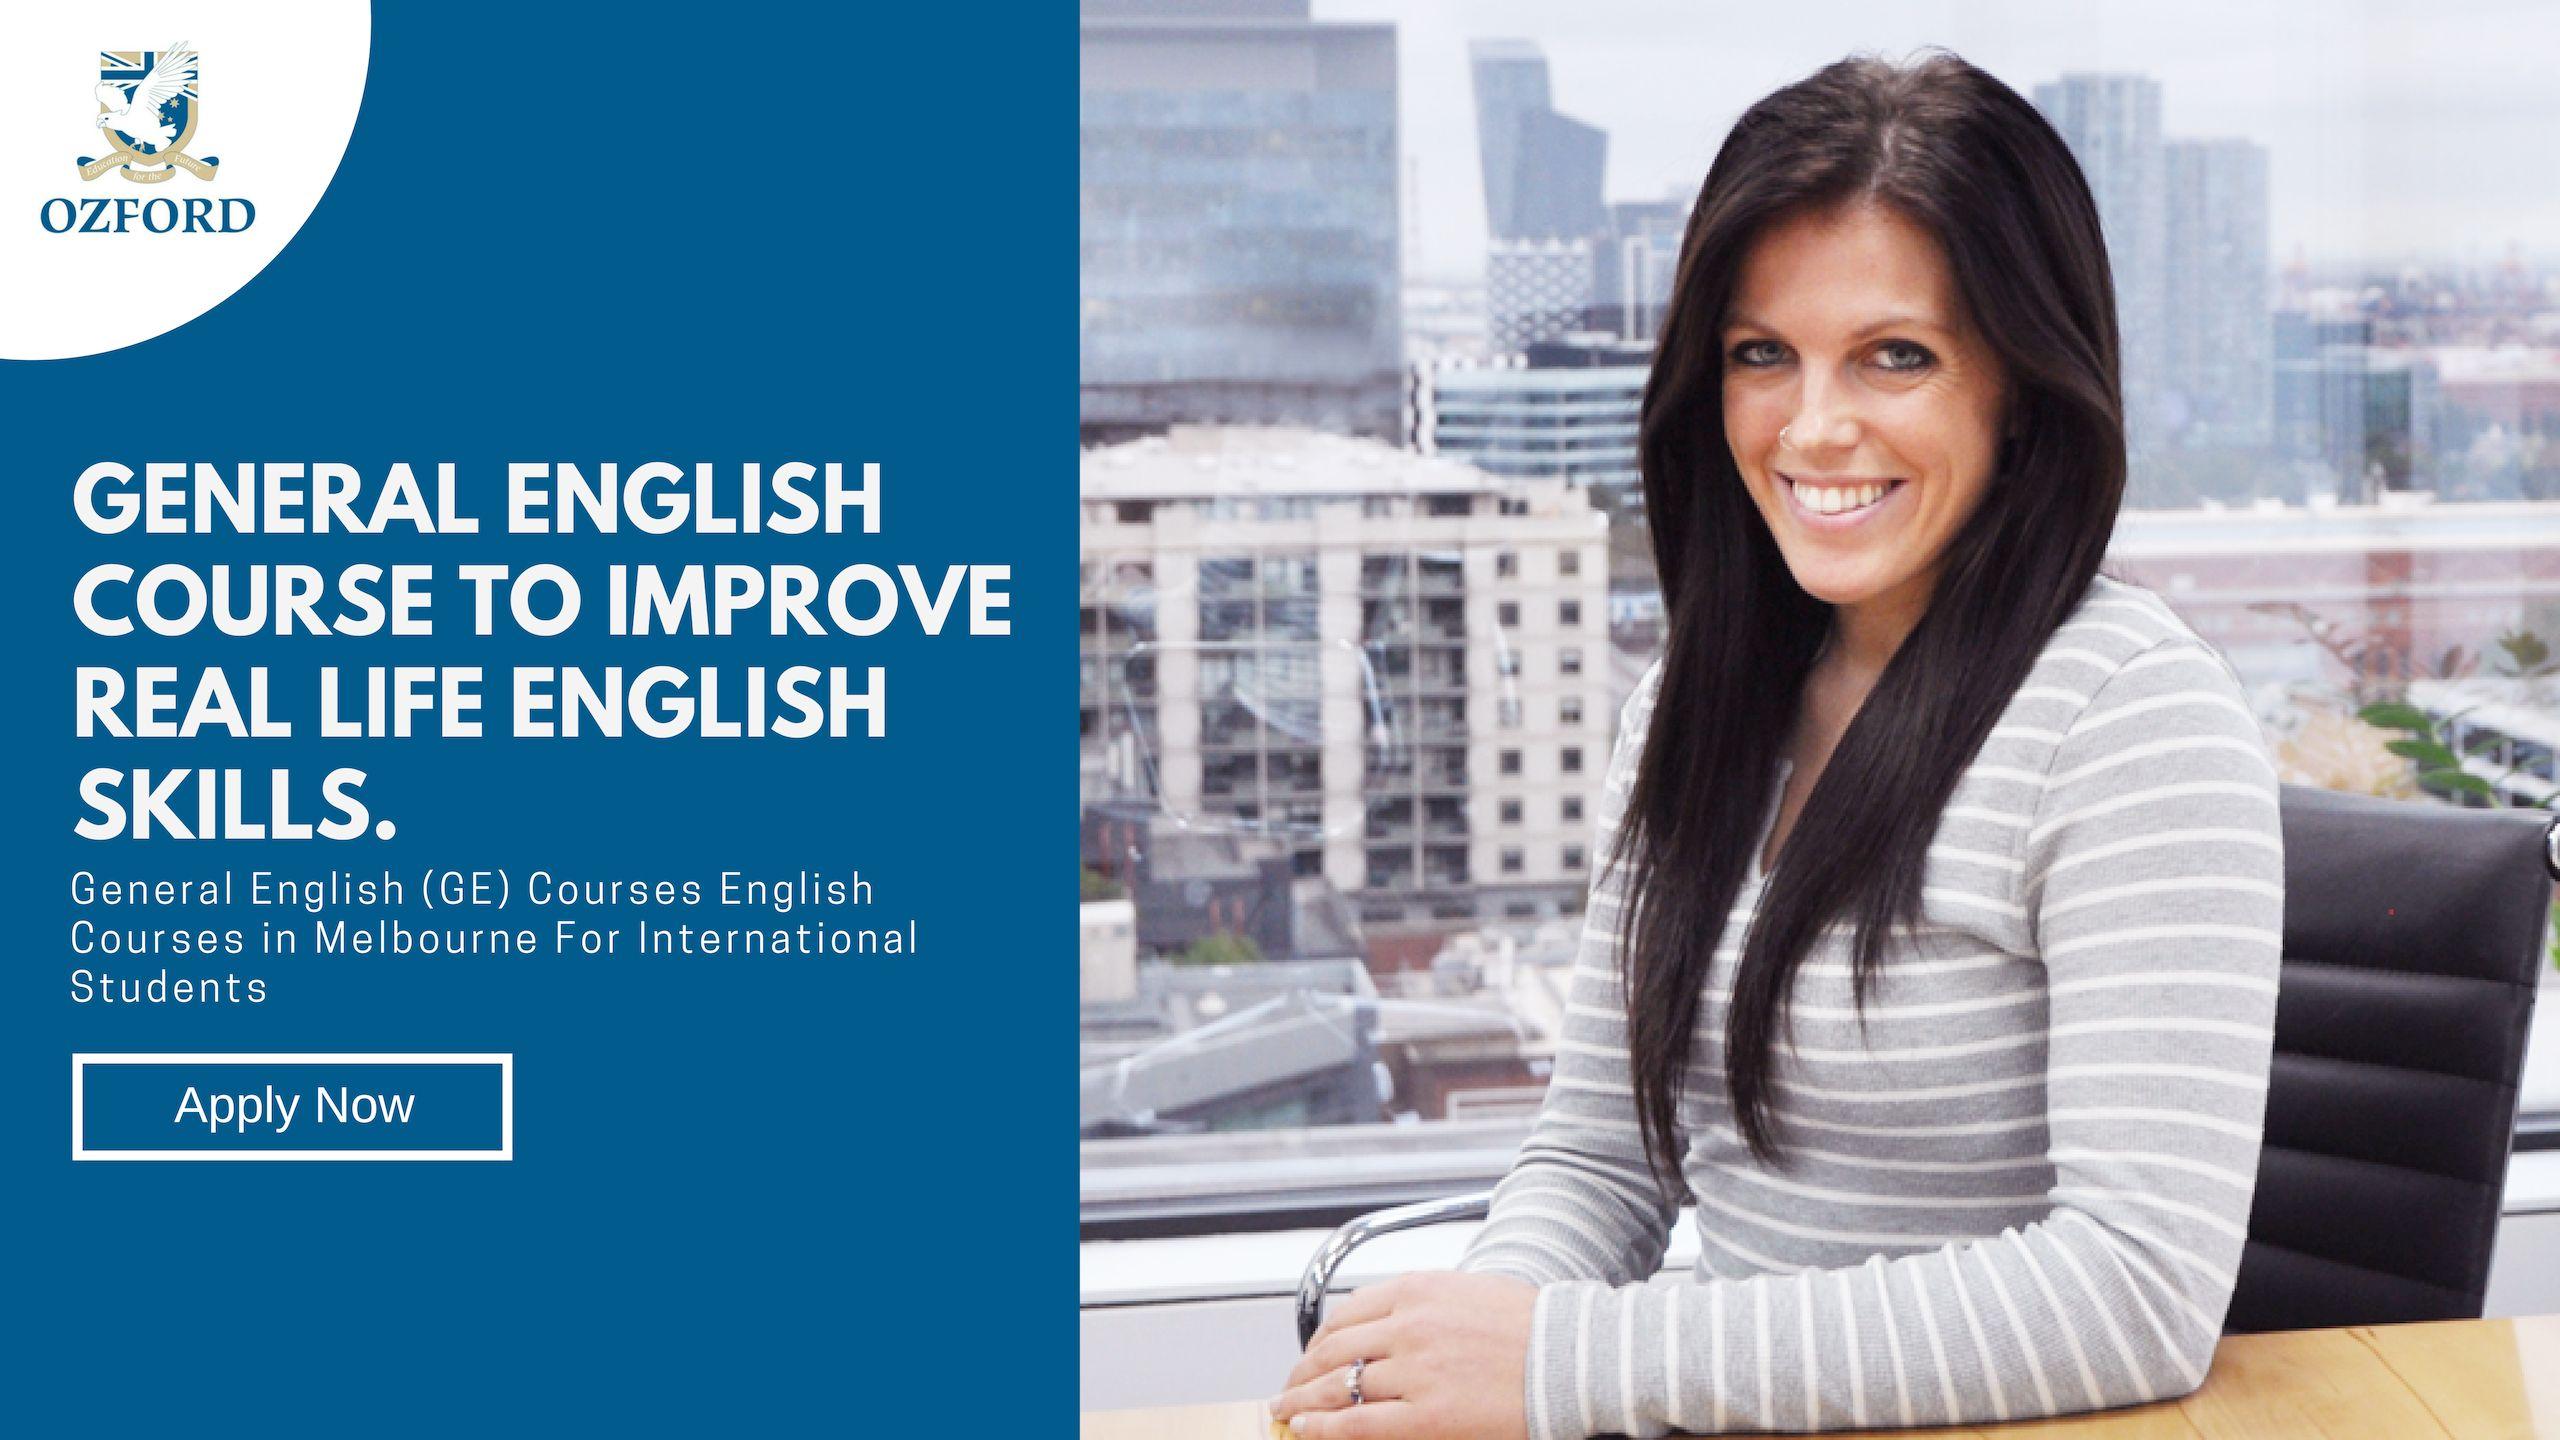 General English Course Melbourne Ozford Australia English Course Real Life English Educational Programs